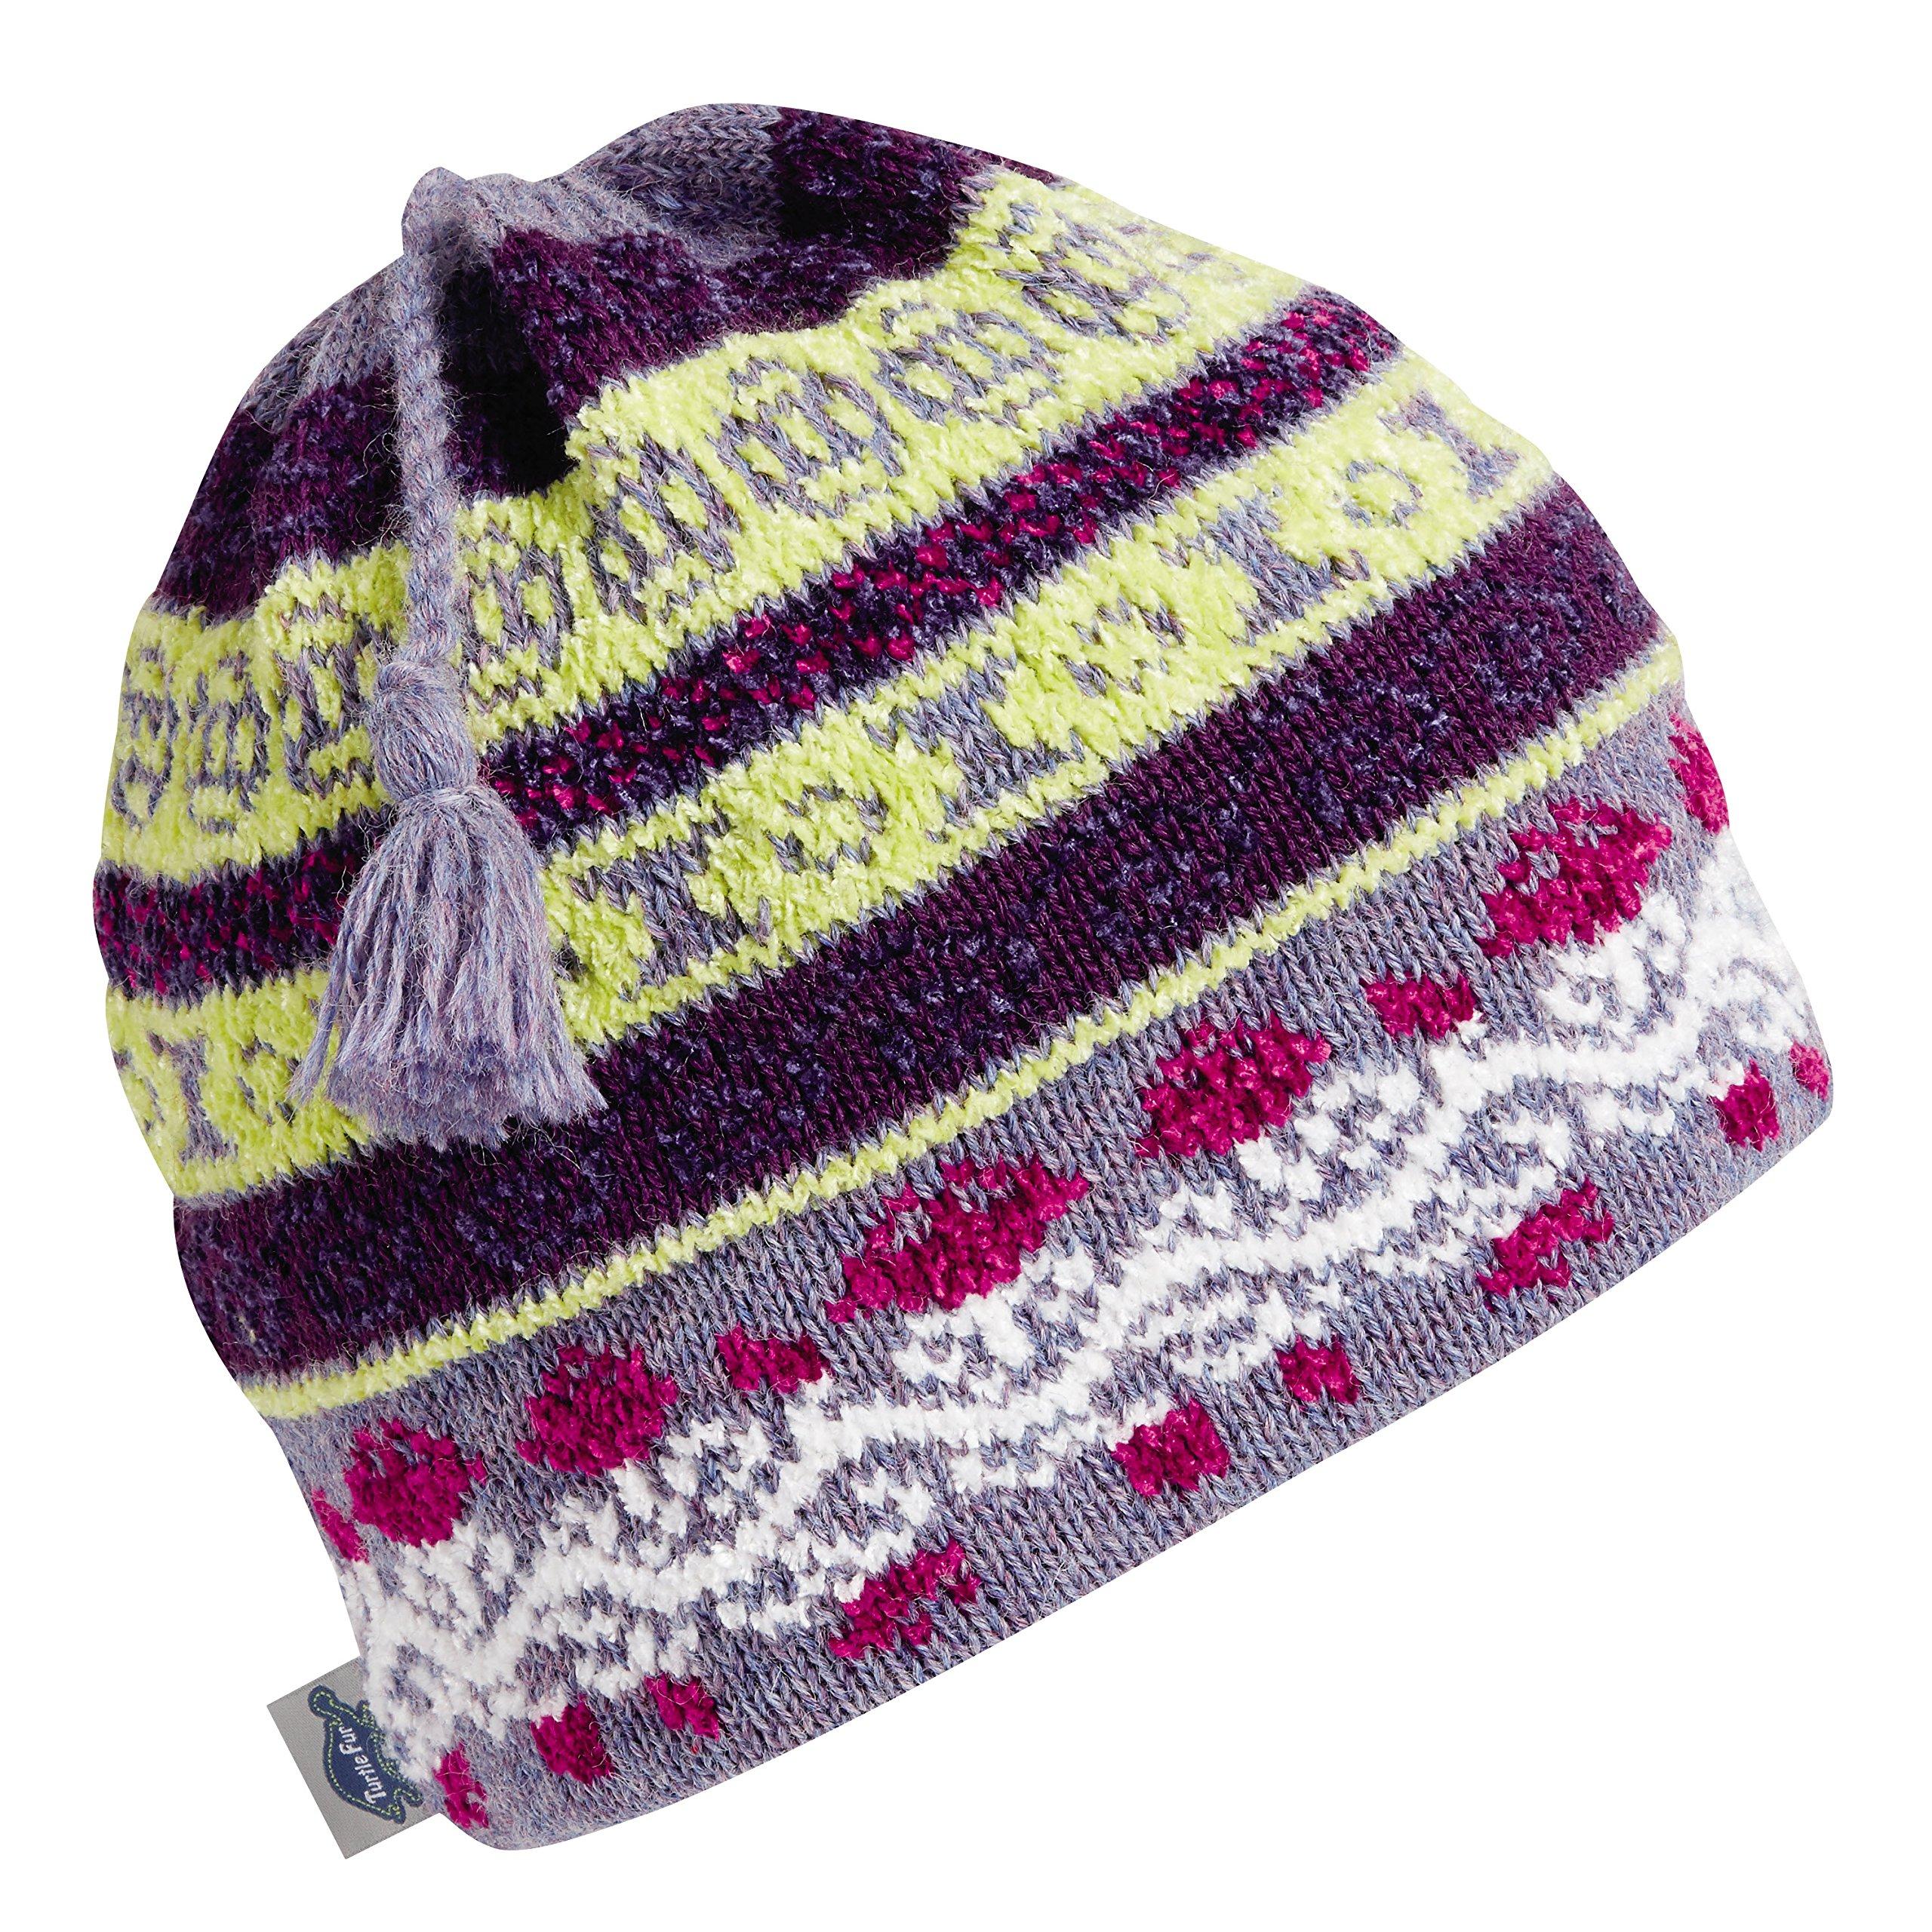 Turtle Fur Lady Fairisle Women's Classic Wool Tassel Ski Hat Columbine Heather